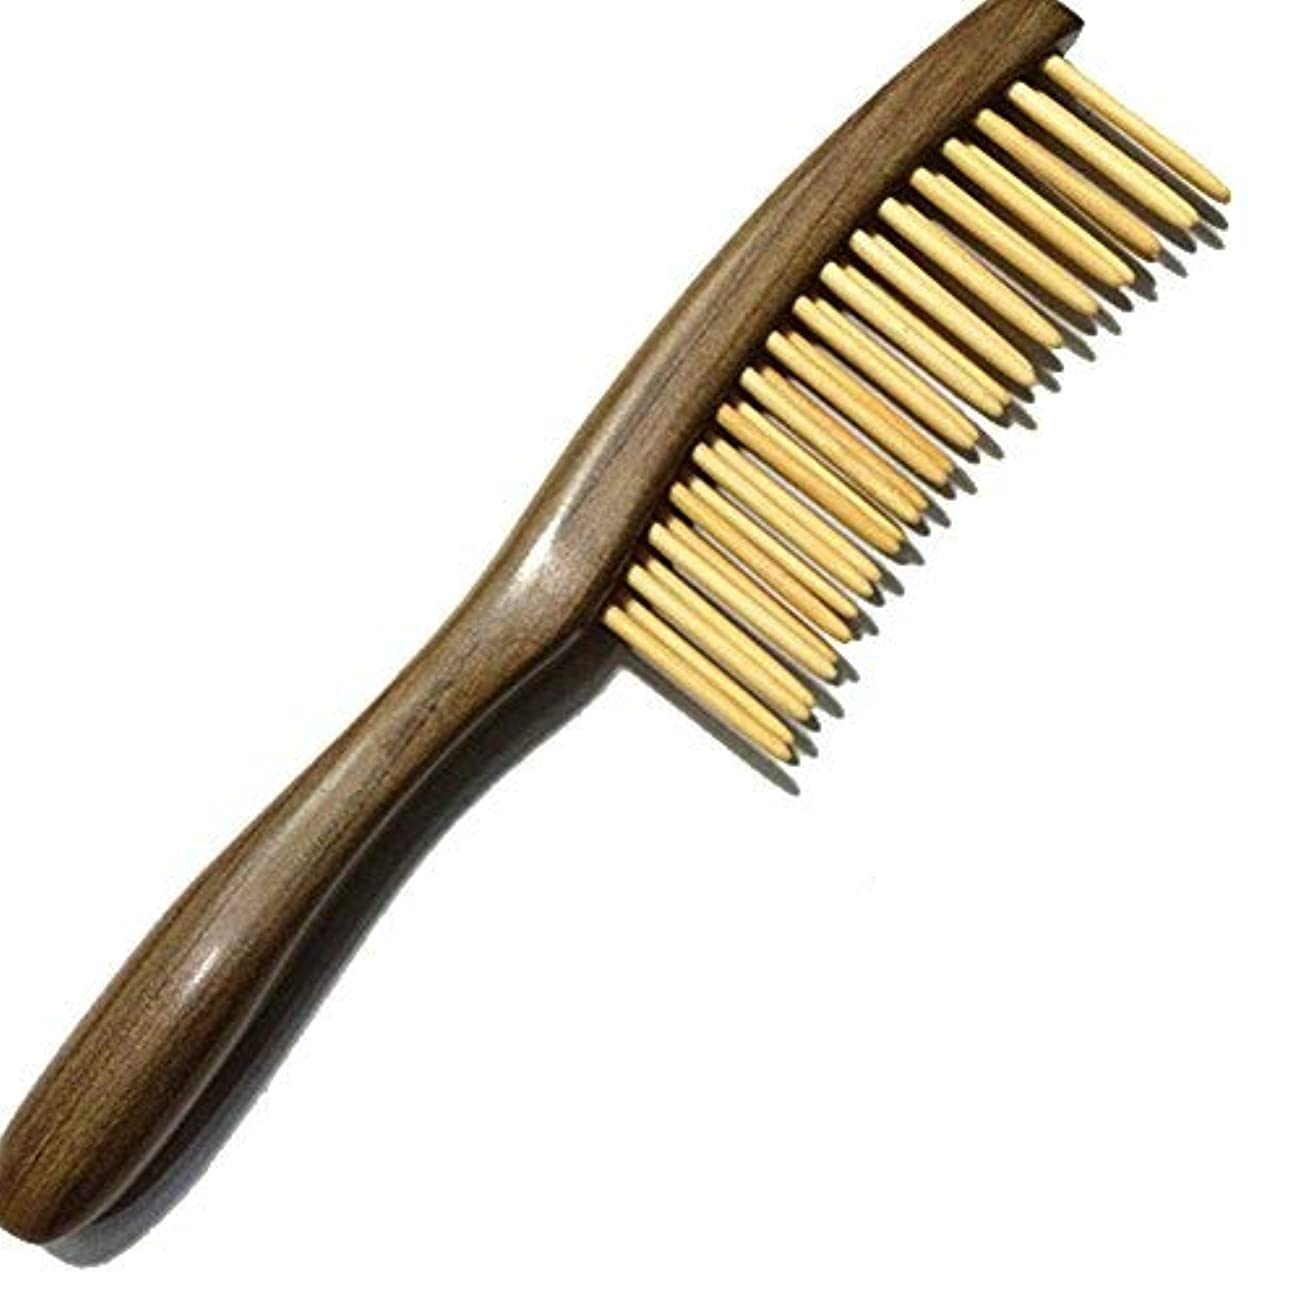 Fitlyiee Double Rows Teeth Sandalwood Hair Comb Anti-Static Handmade Wide Tooth Wooden Comb [並行輸入品]